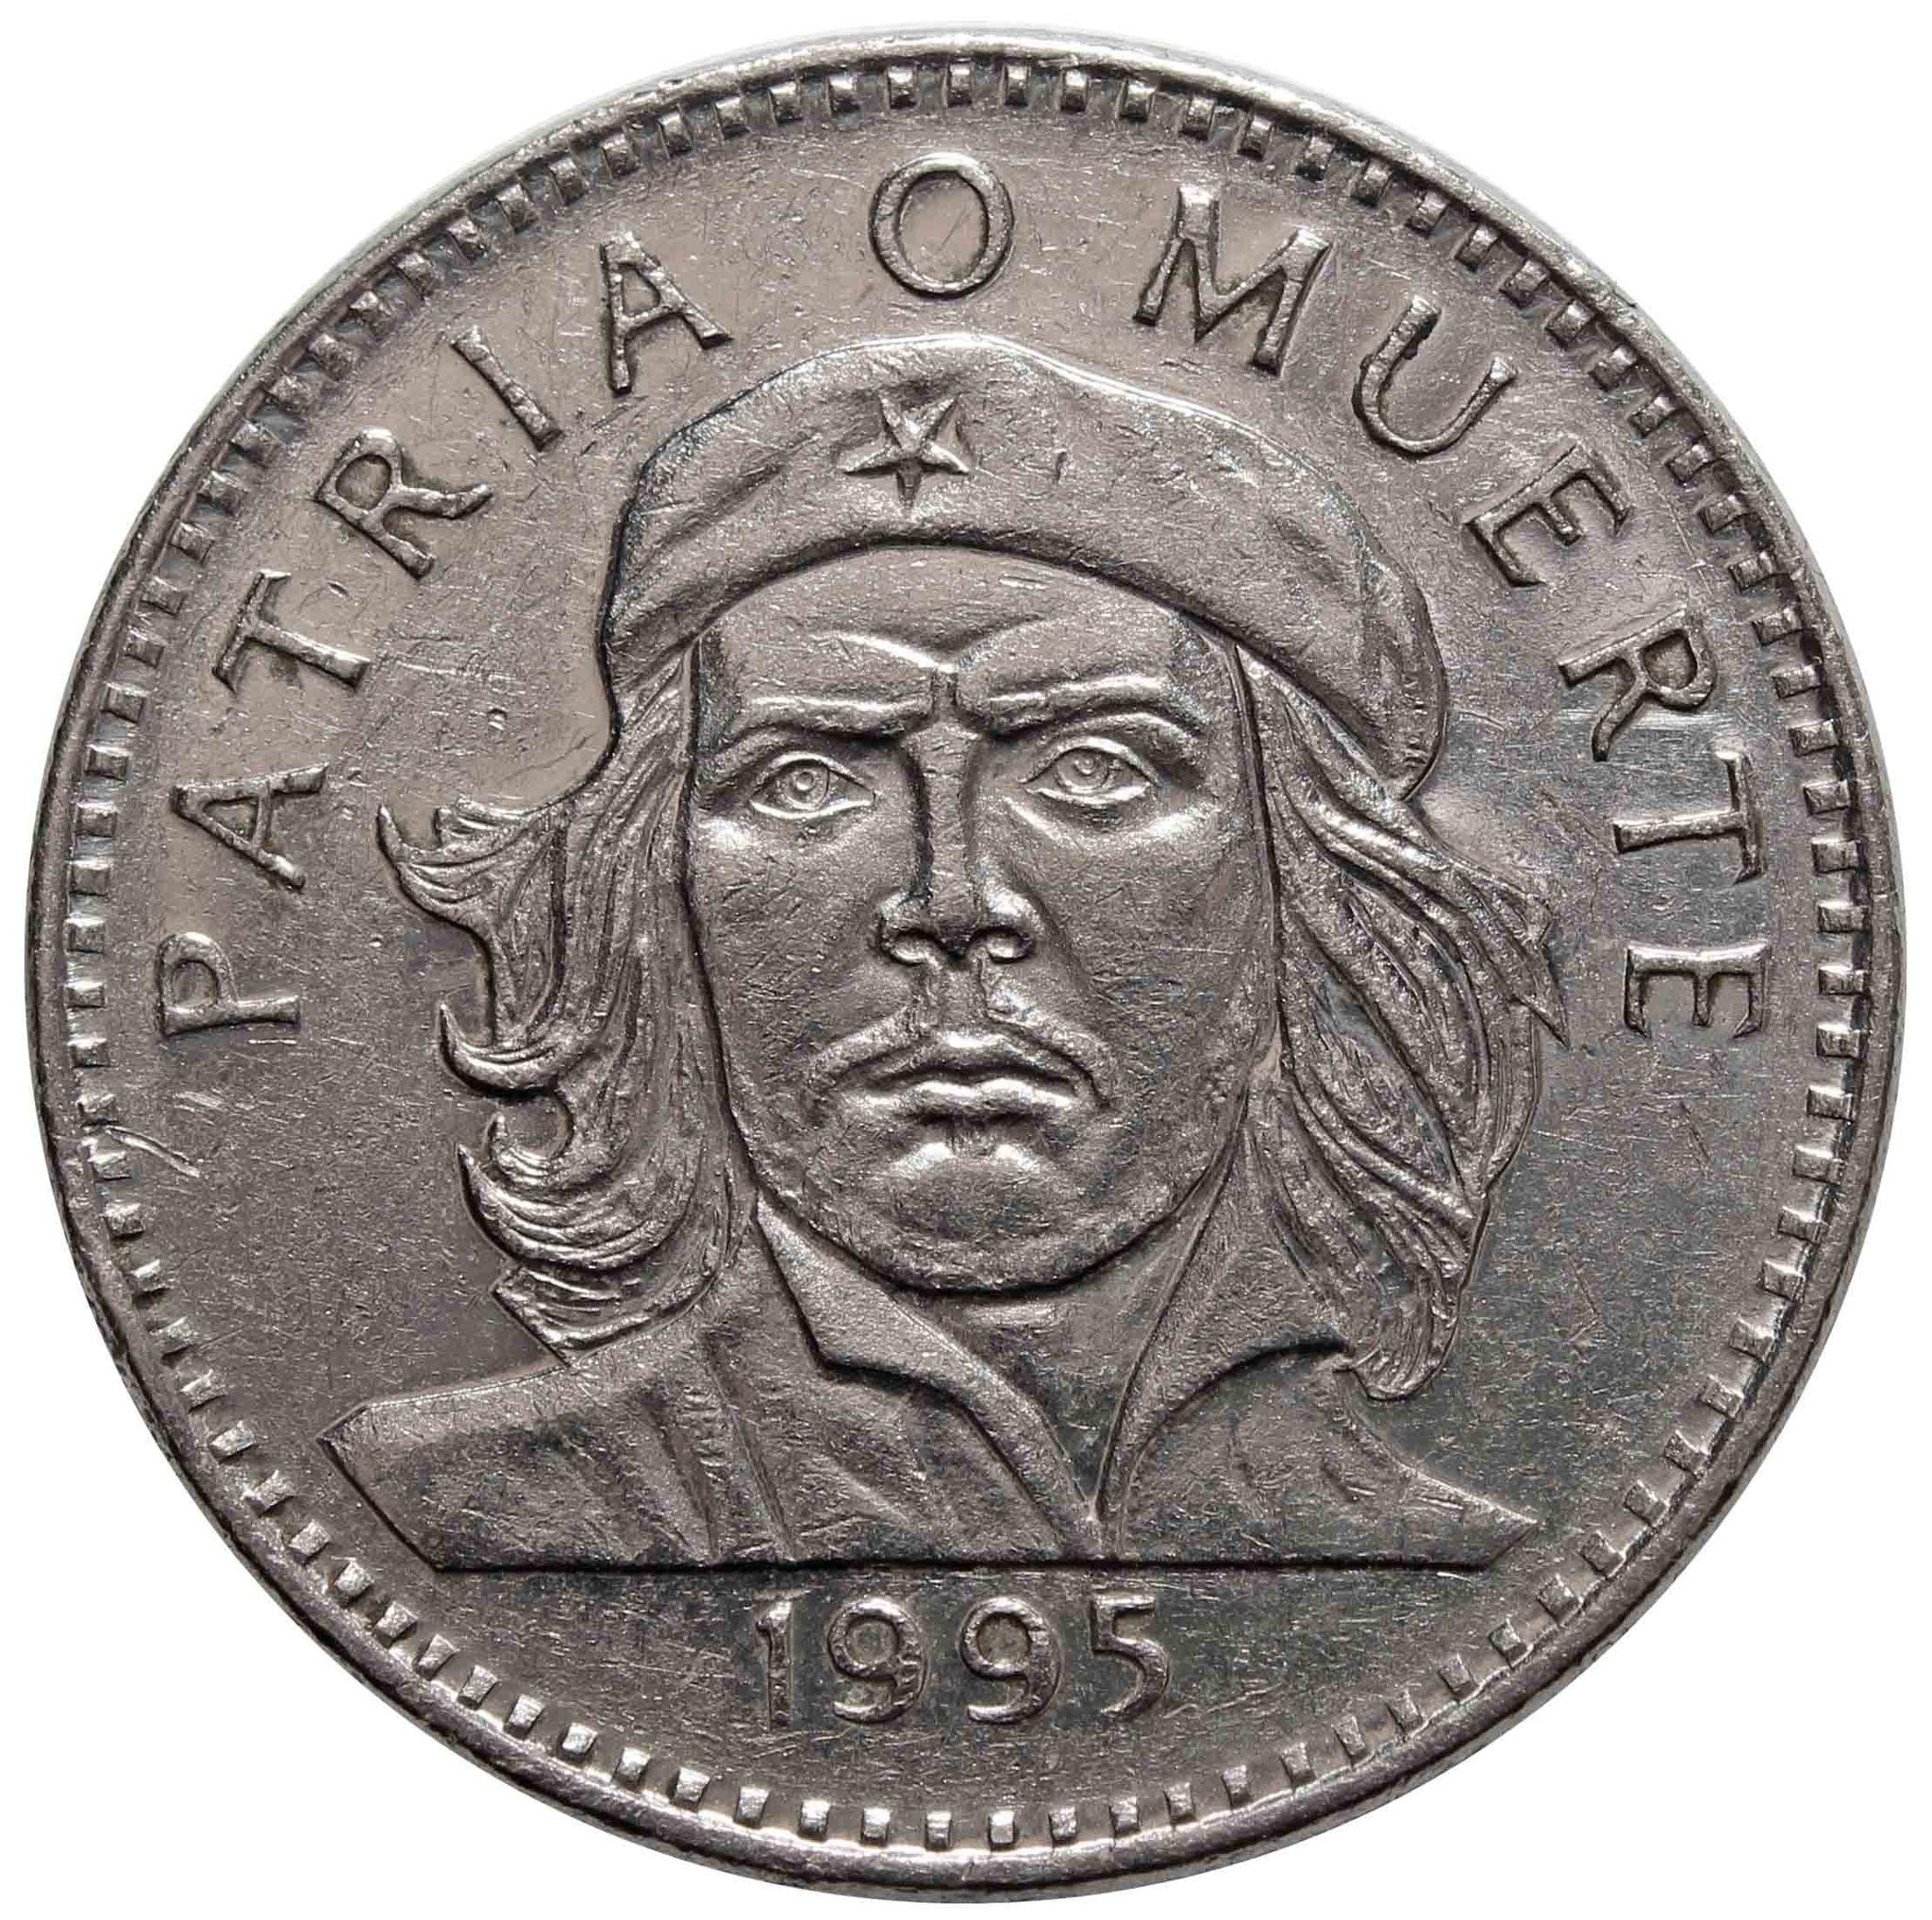 3 Песо 1995 г. КУБА. Че Гевара. XF+